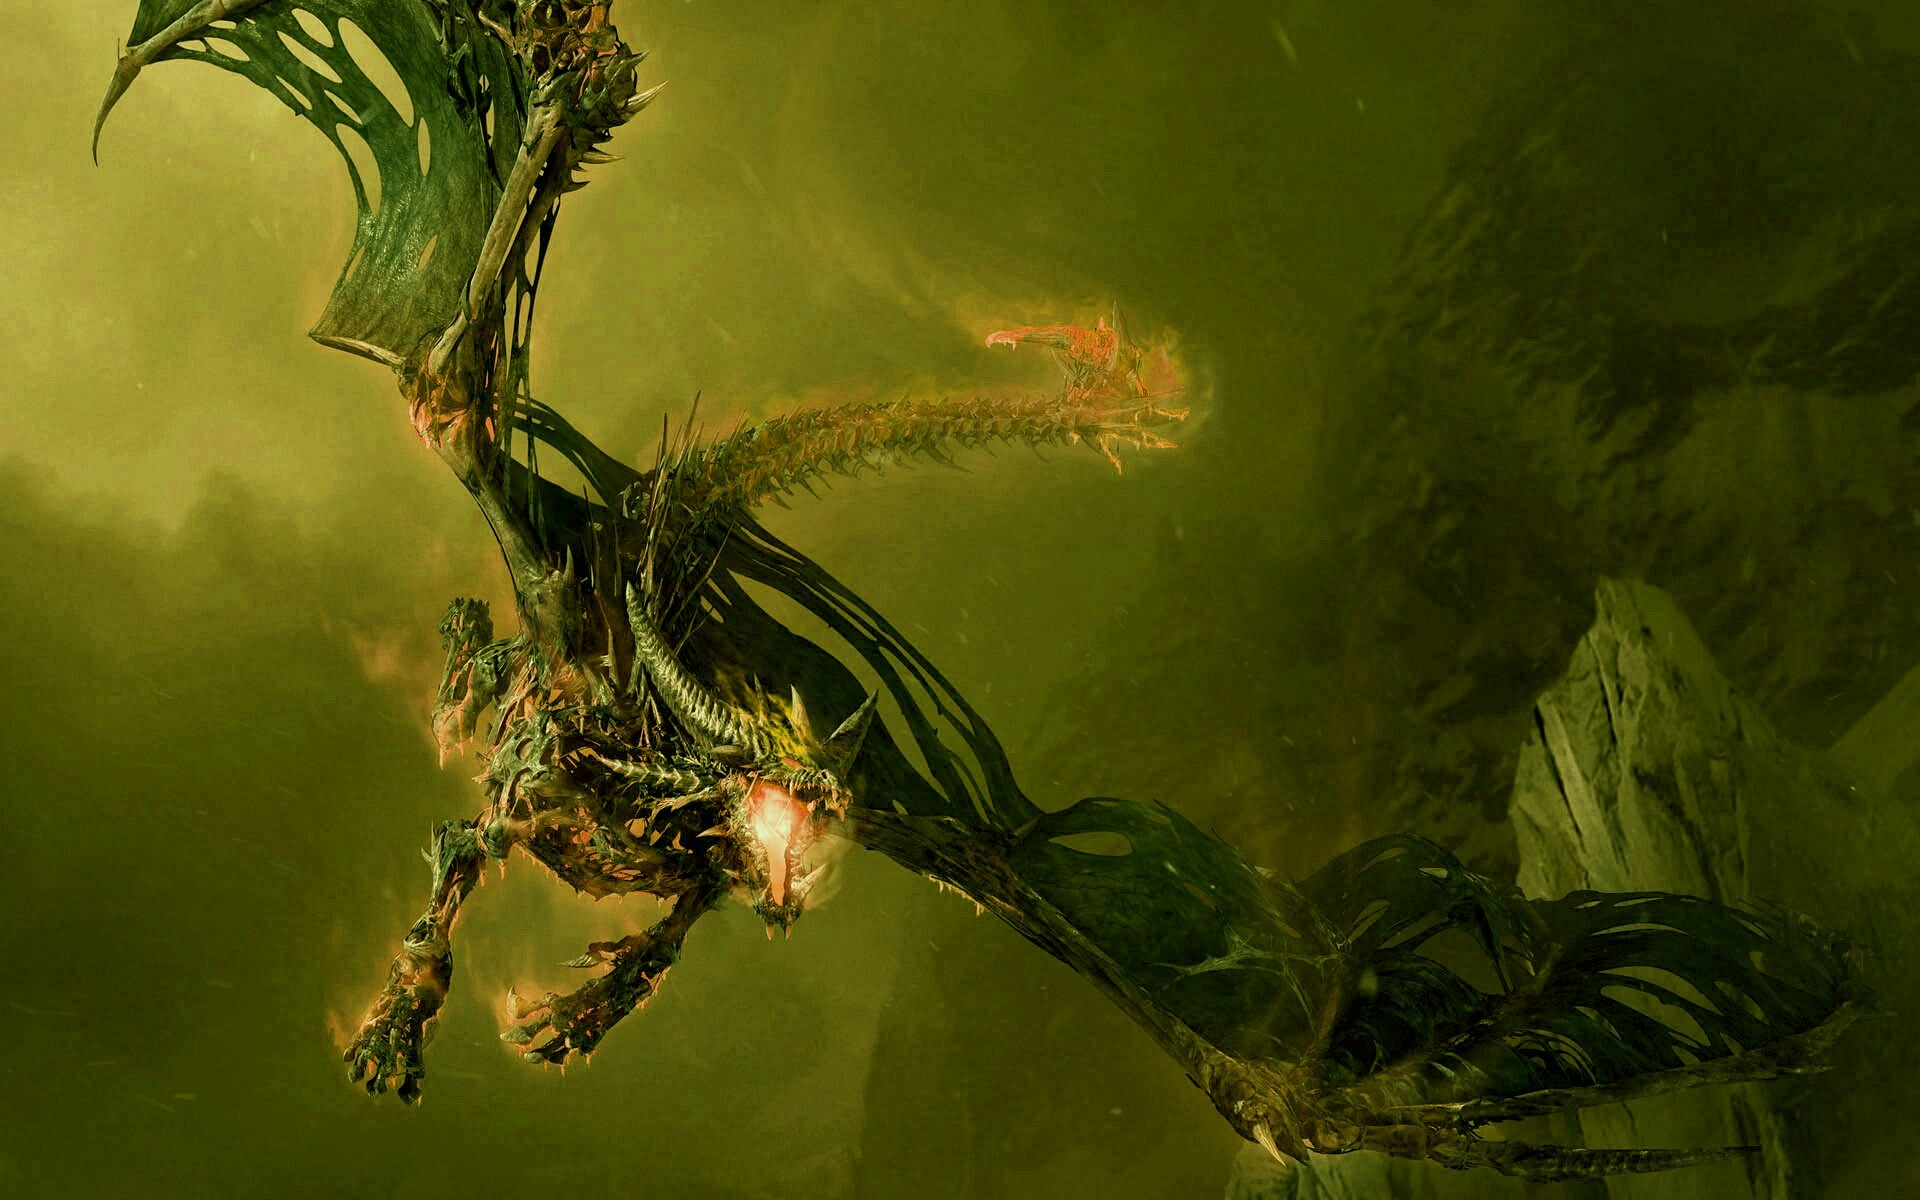 Dragon Desktop Backgrounds (62+ pictures)